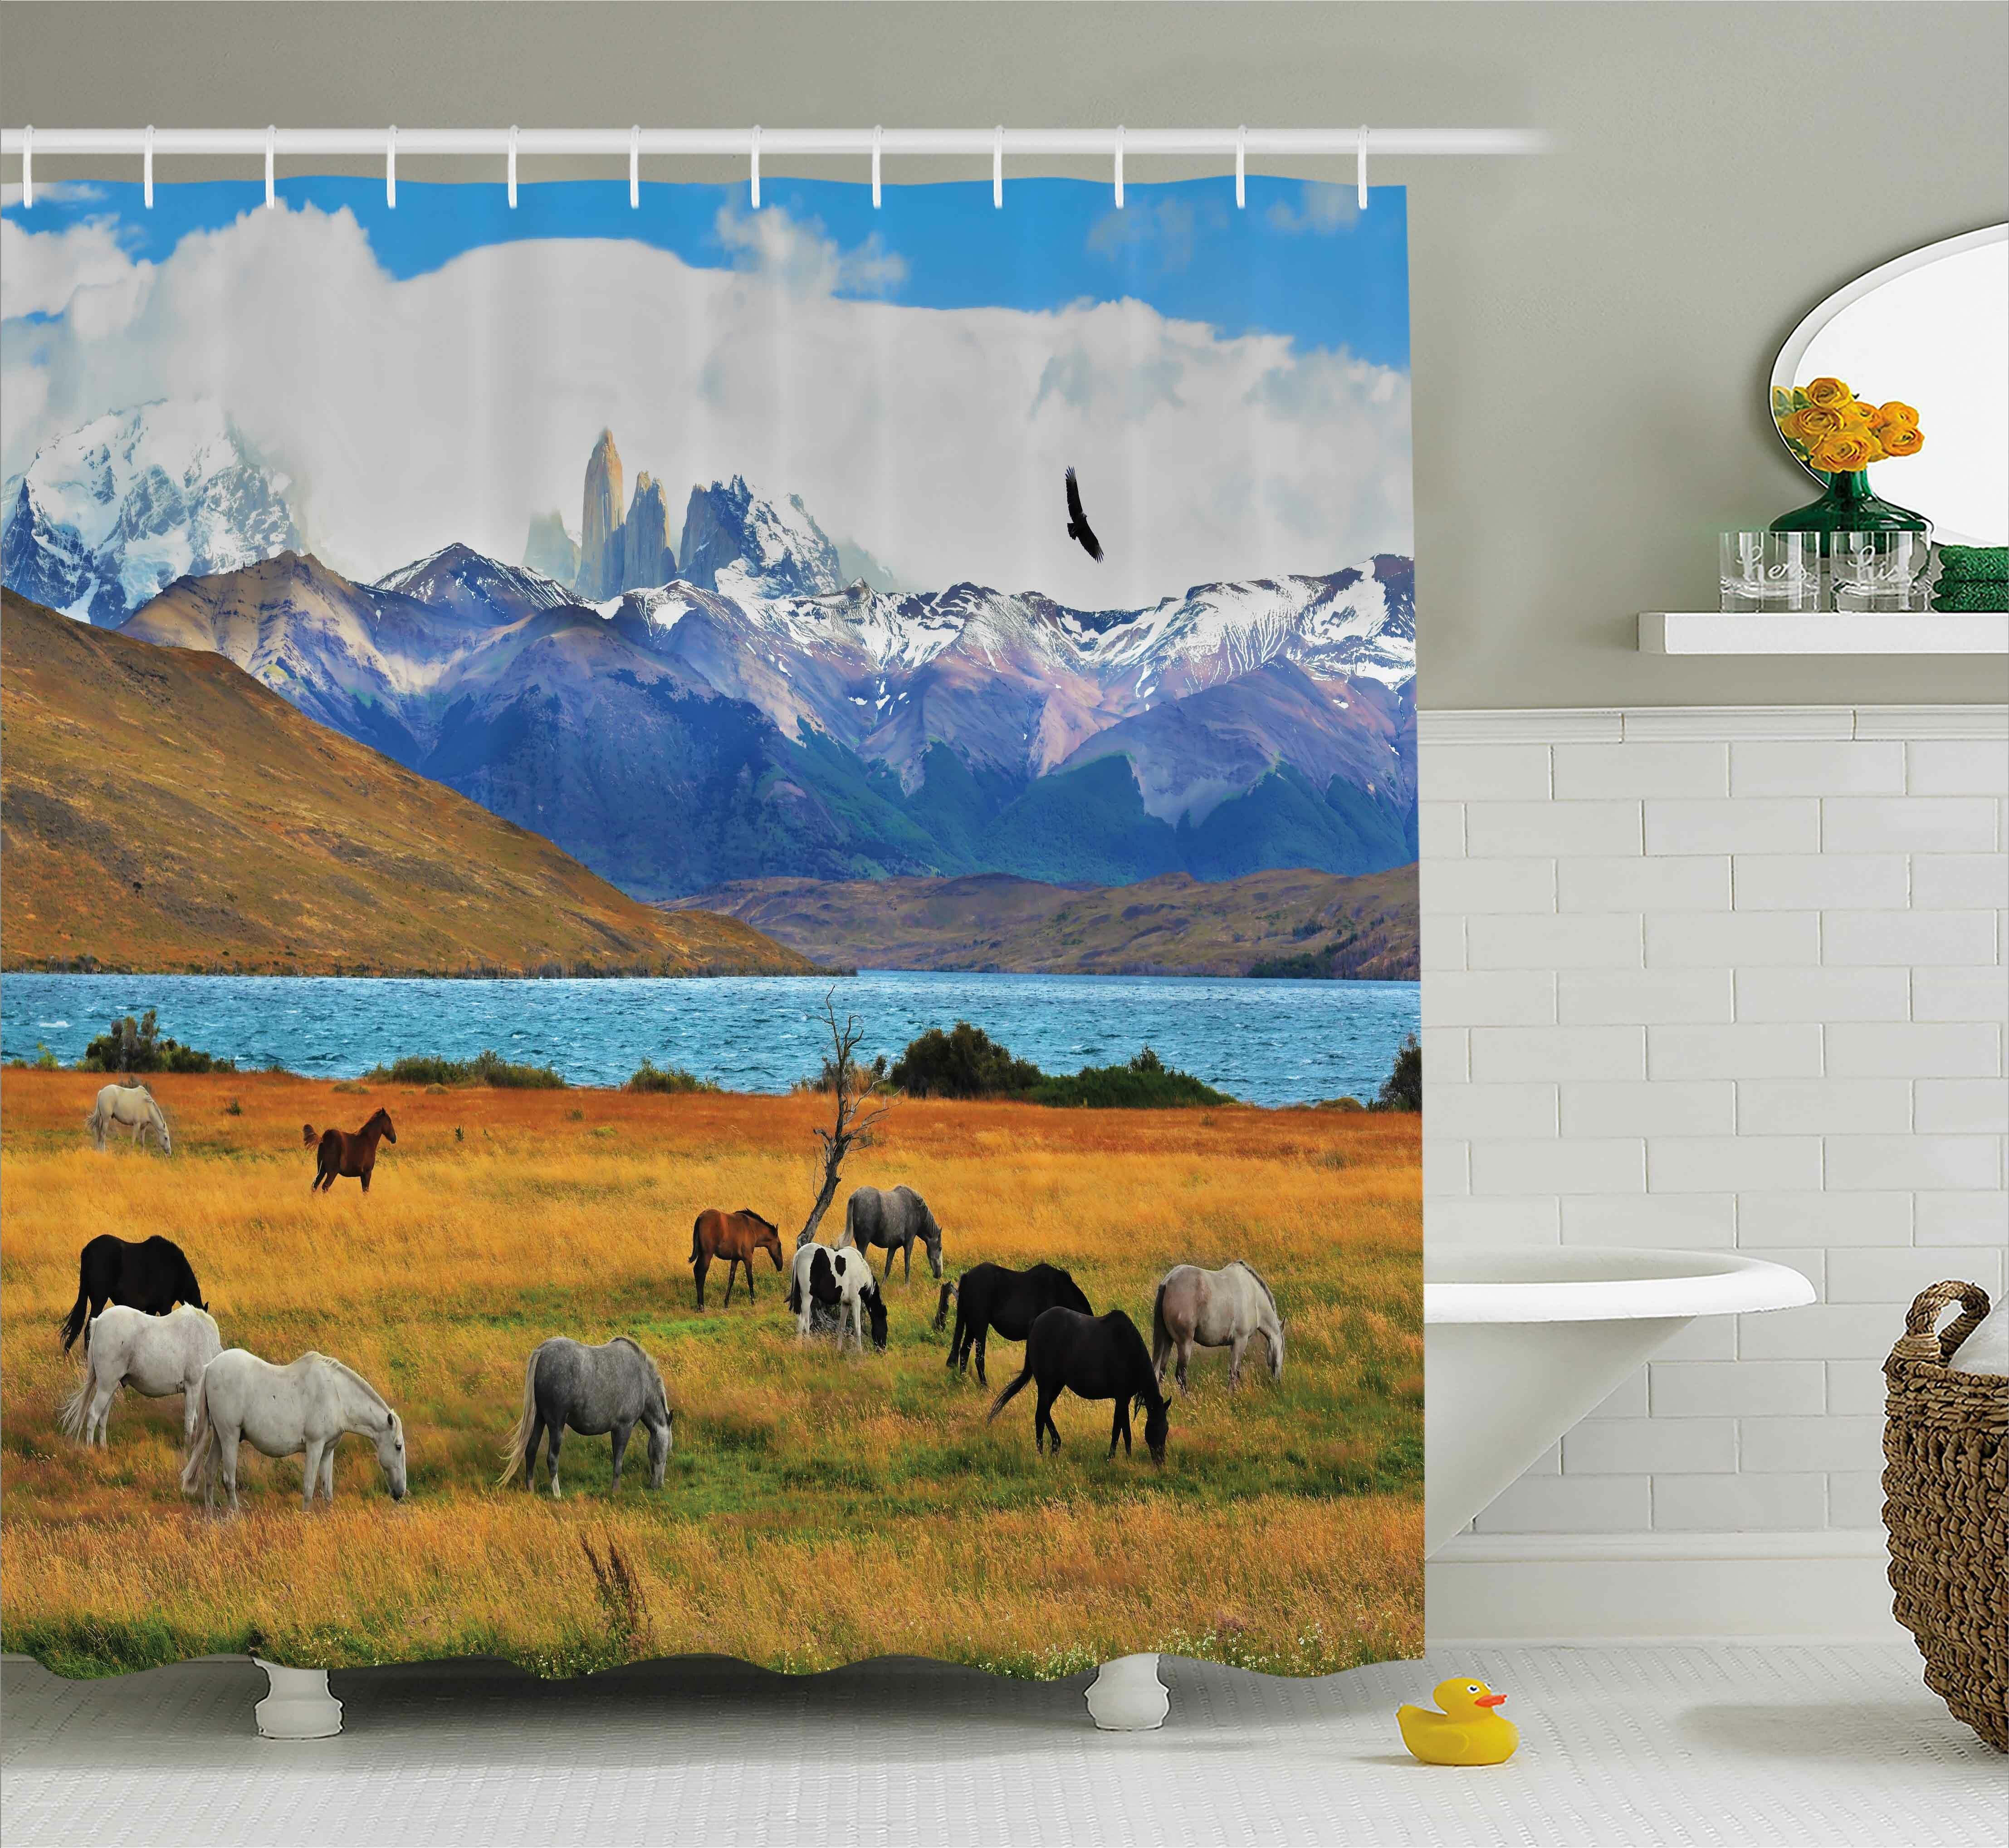 Higden Farm Horse Shower Curtain Hooks